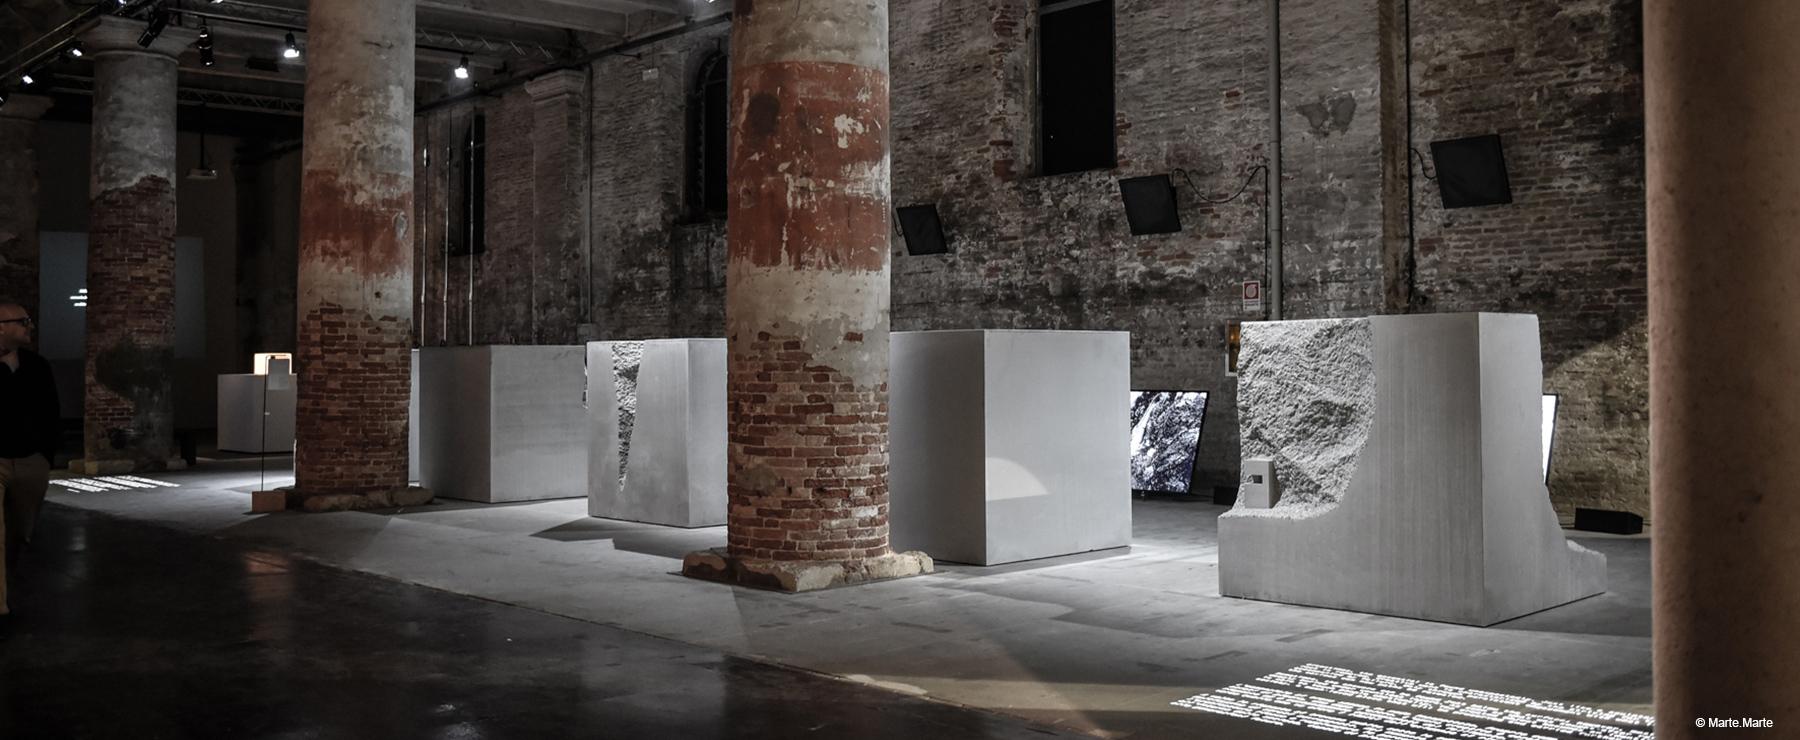 marte-marte-venice-biennale-produced by dade design